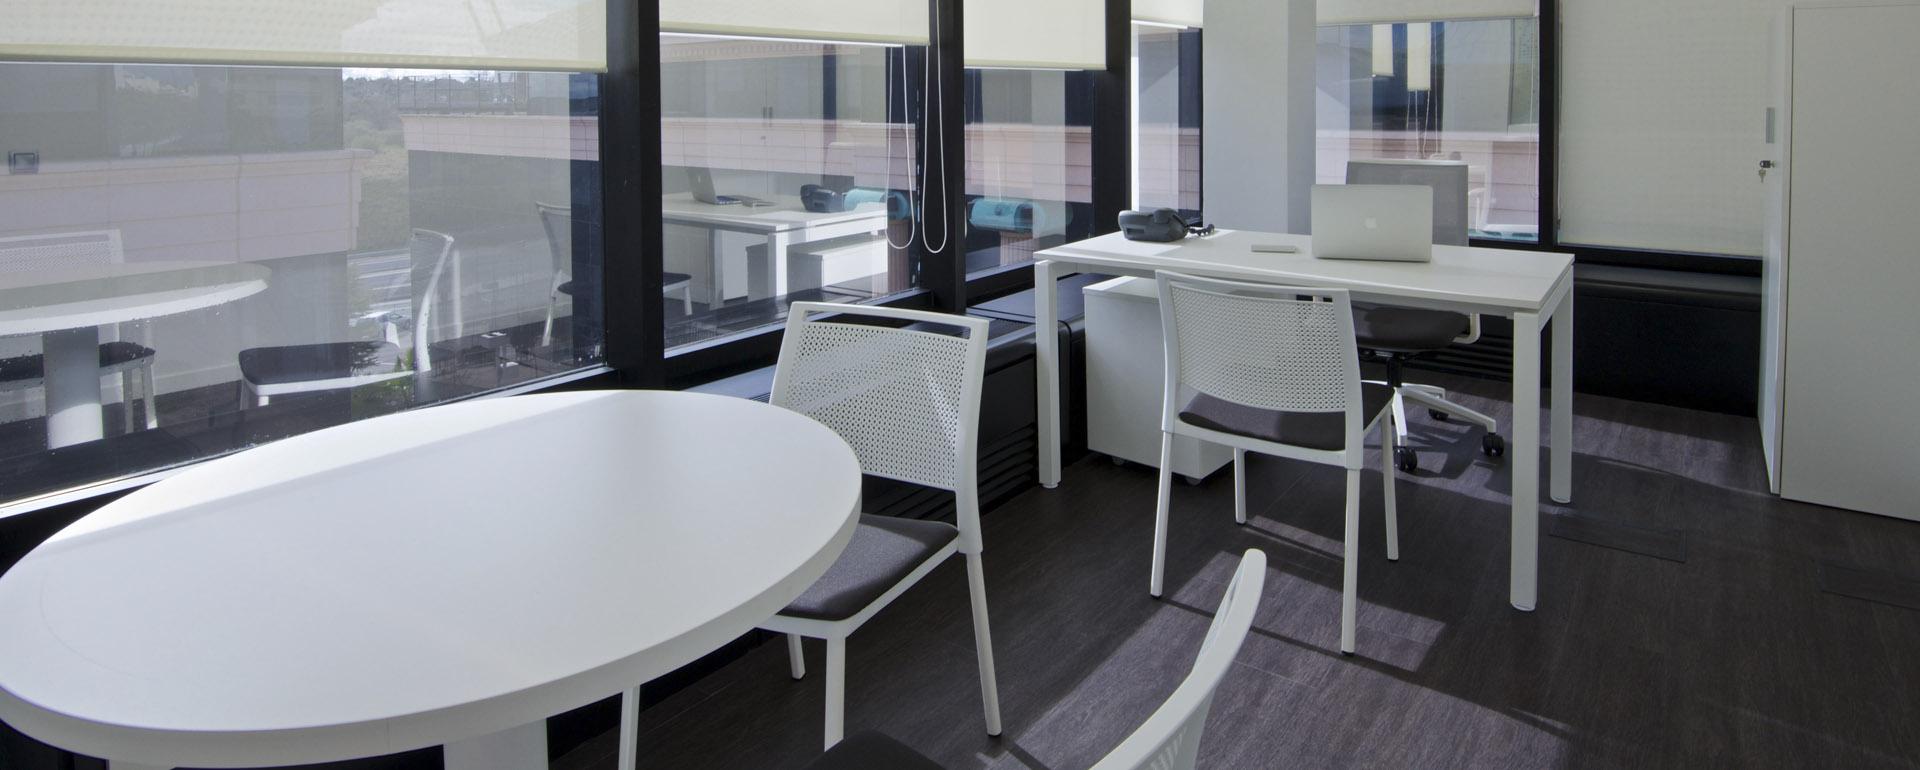 Initia alquiler de despachos equipados en pozuelo for Alquiler oficinas pozuelo